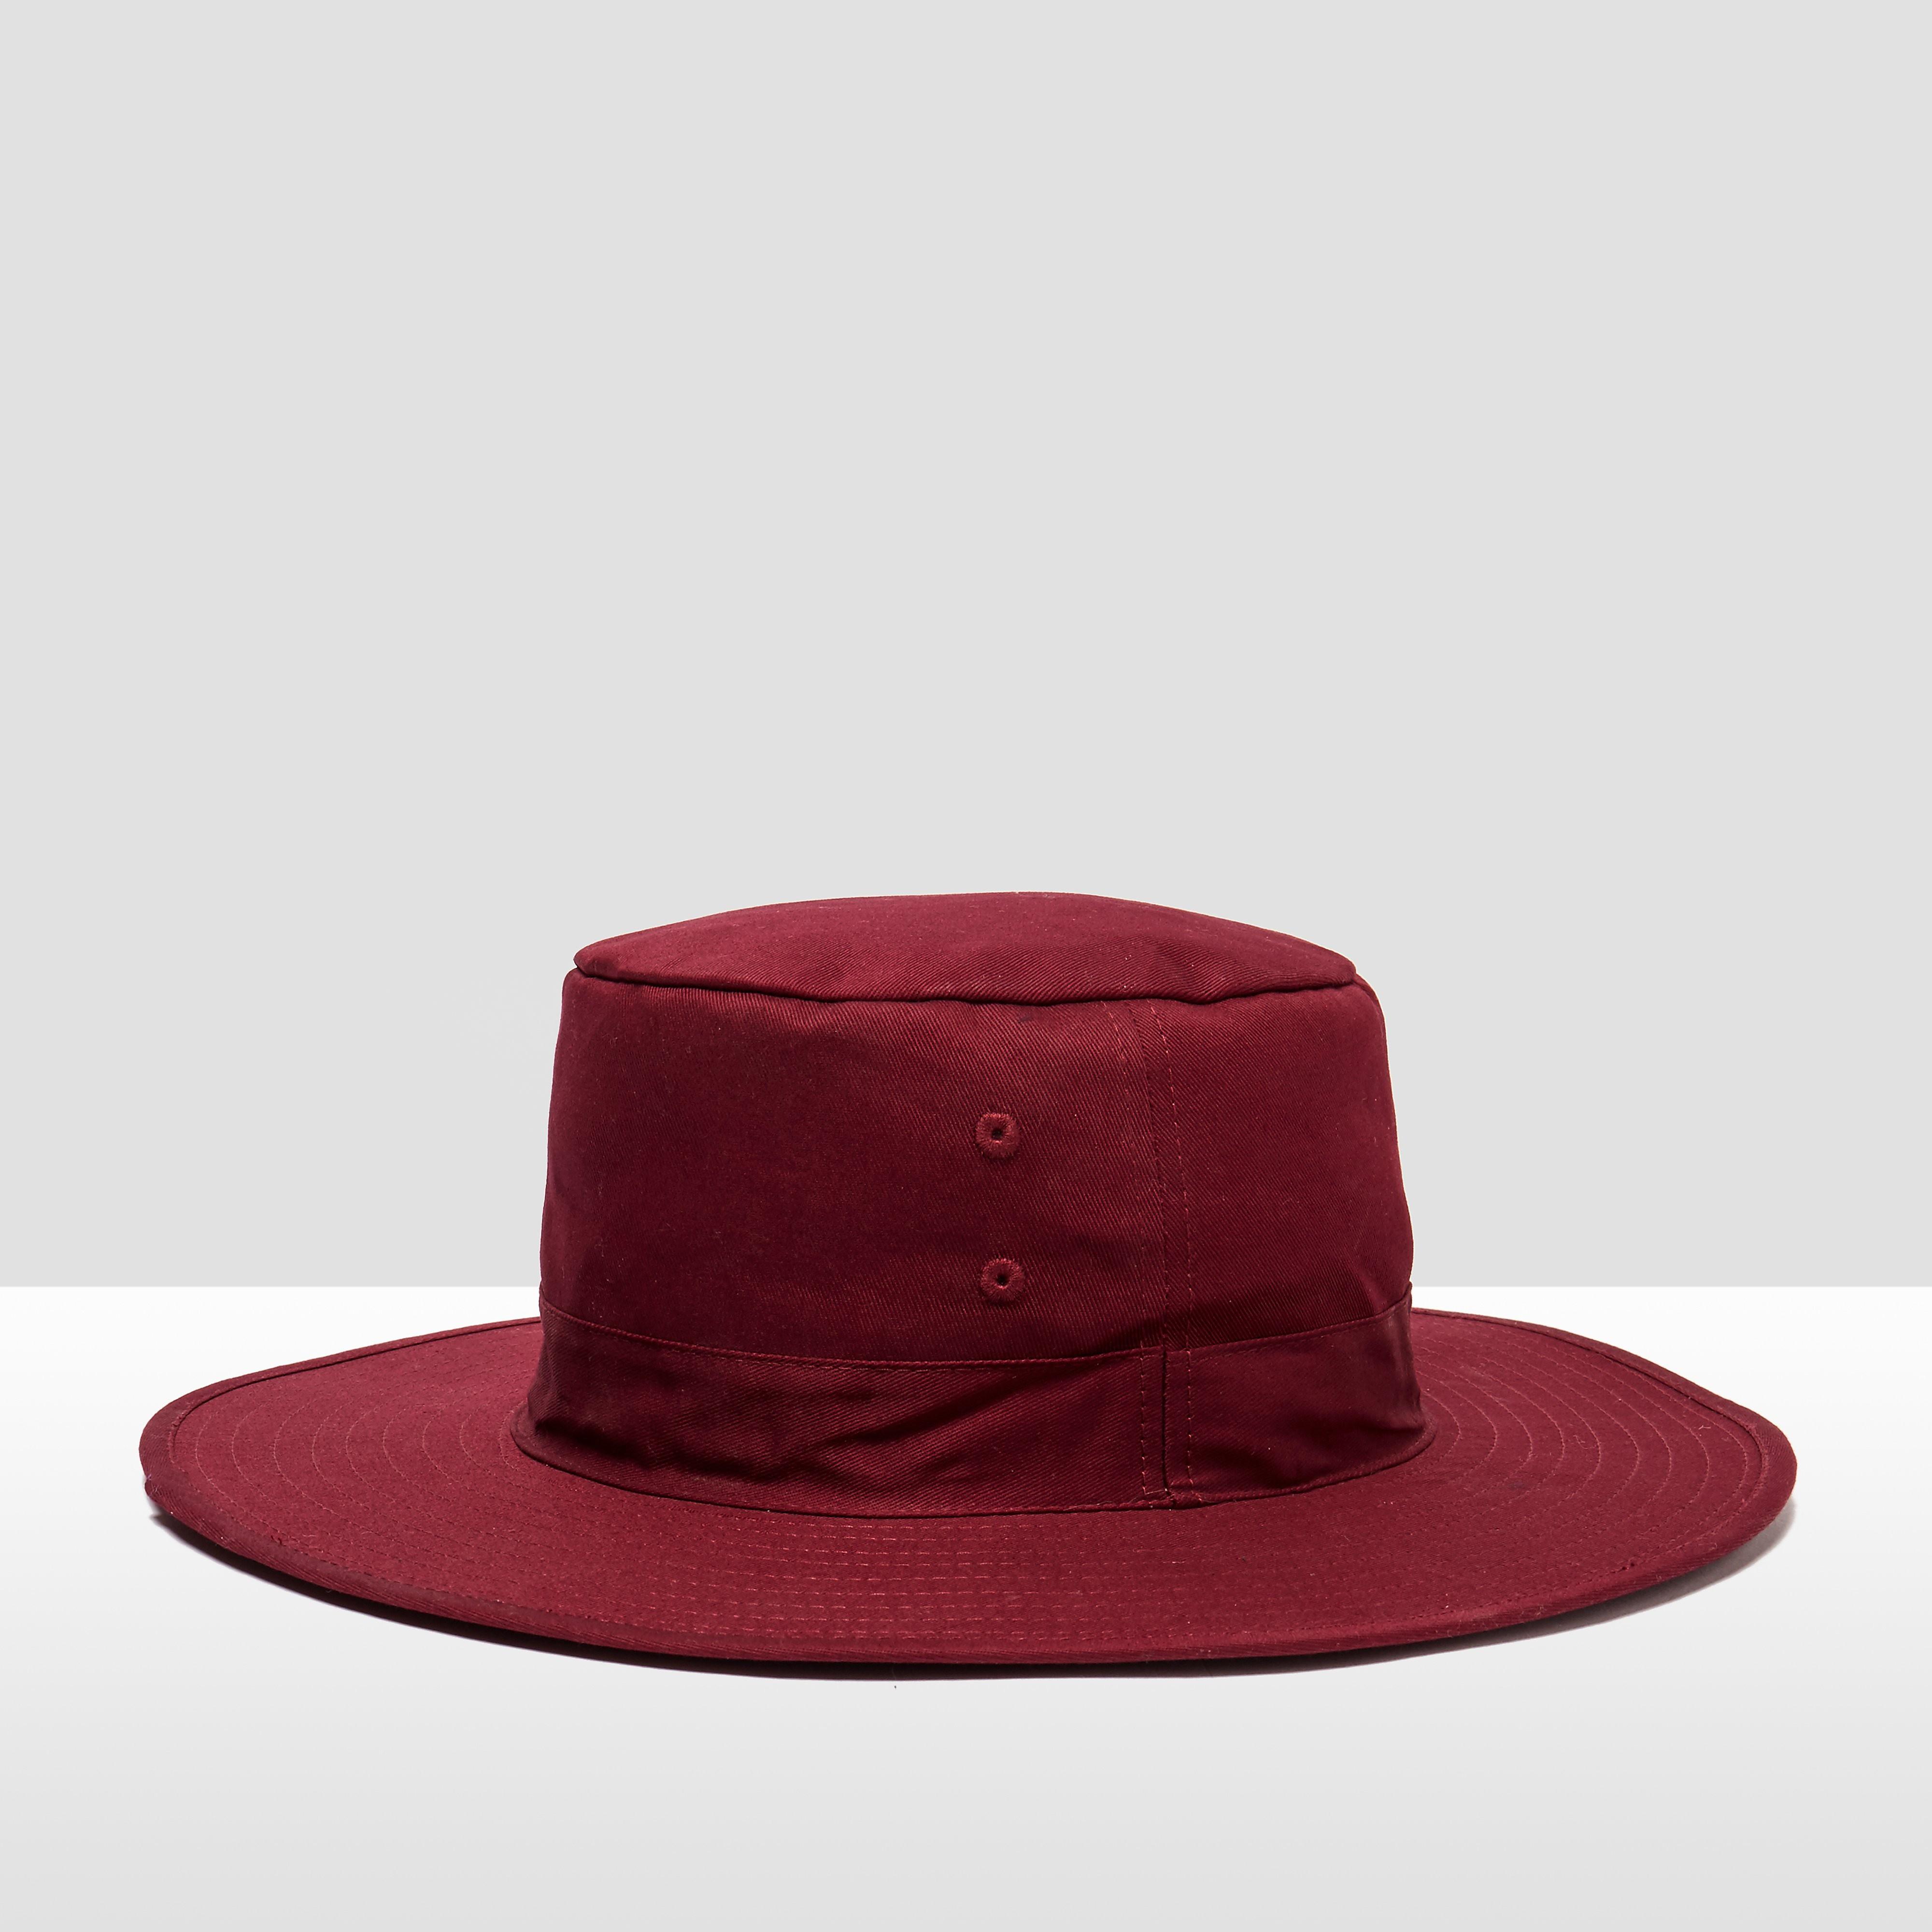 Gunn & Moore Panama Hat